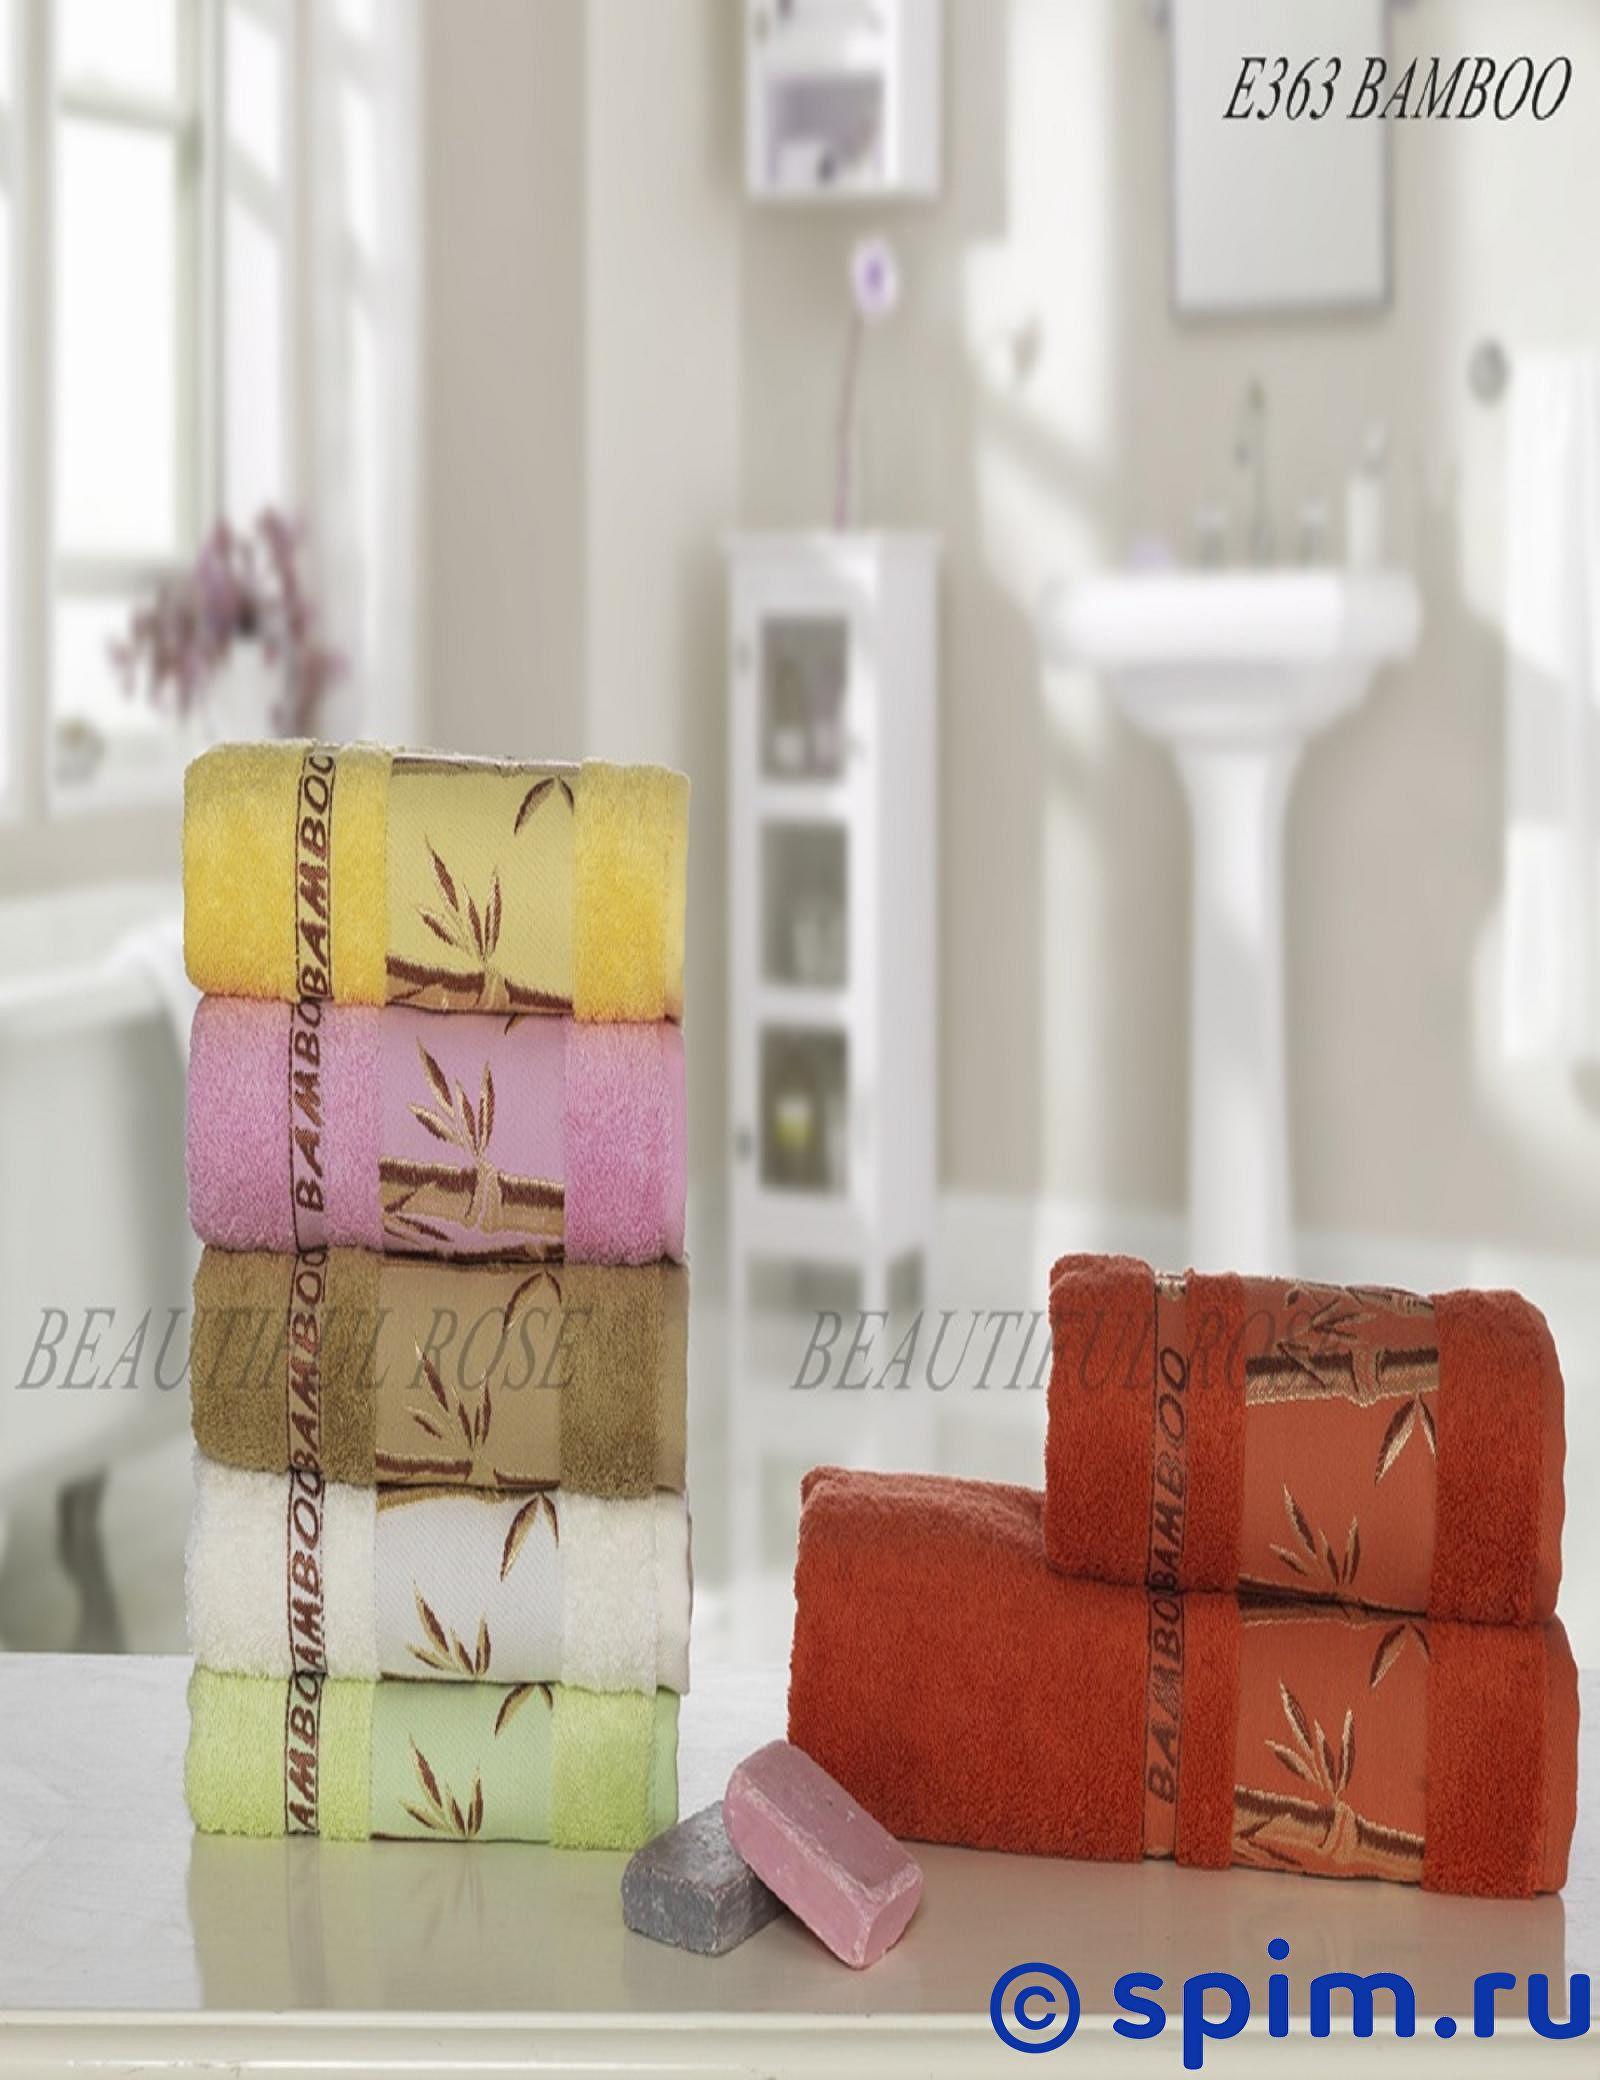 Набор из 6-ти полотенец Rose Бамбук E363 50х90 см 50х90 см ментол penelopa бамбук 50х90 70х130 в коробке набор полотенец фиеста